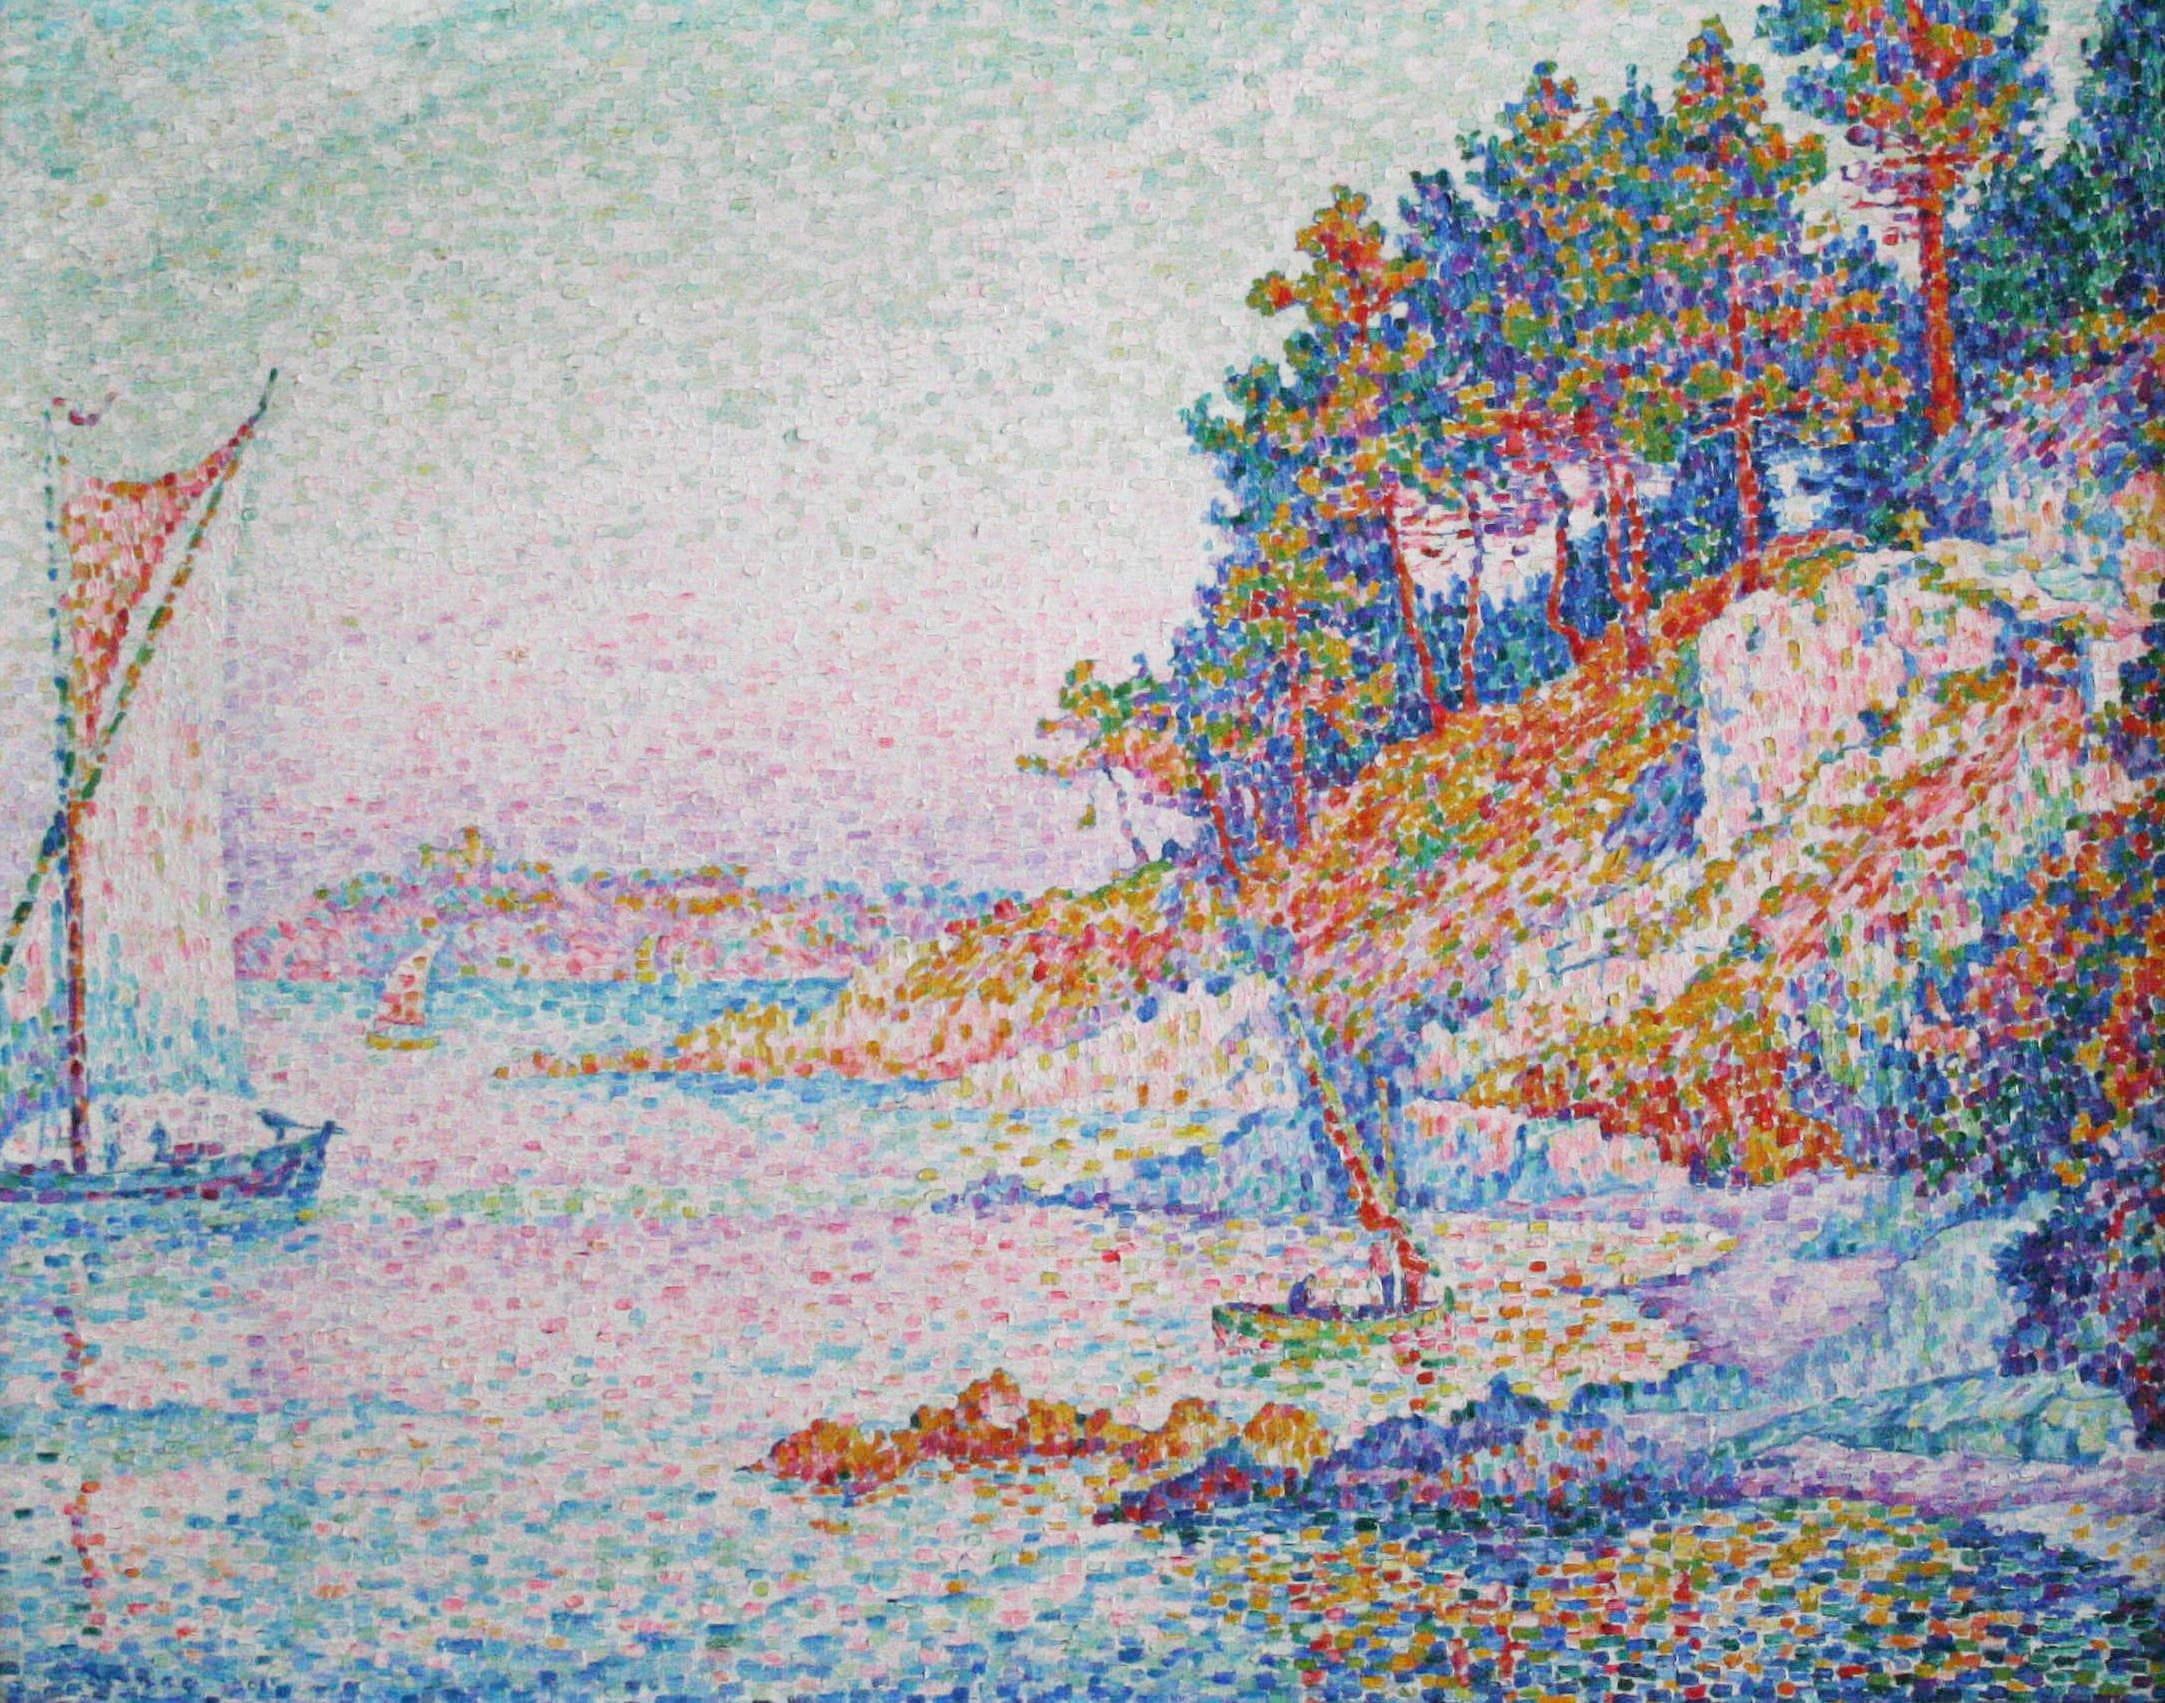 La calanque, Paul Signac (1906)